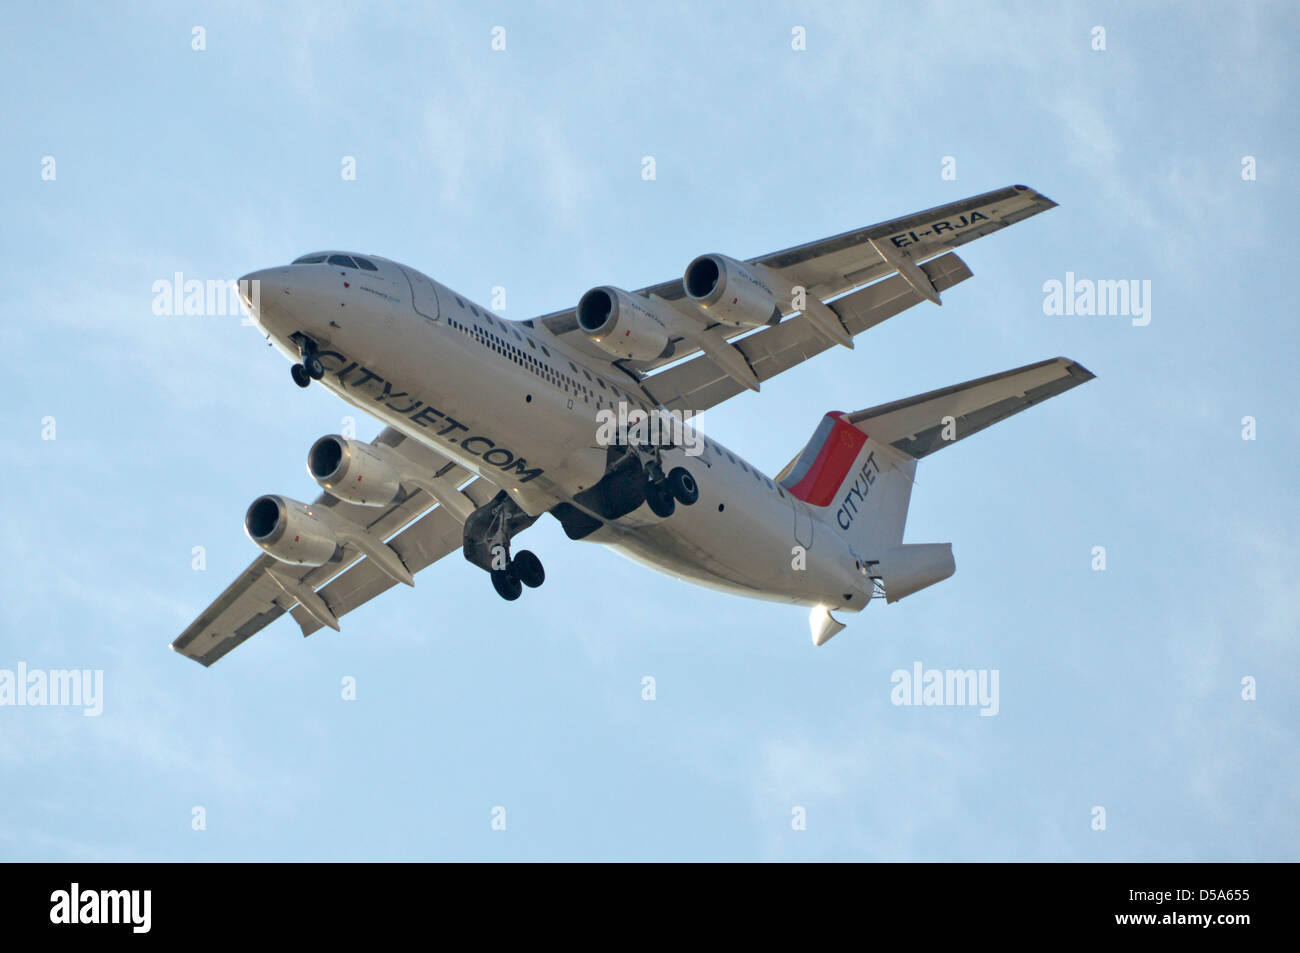 Cityjet British Aerospace Avro RJ85 four engine passenger jet aircraft climbing after takeoff - Stock Image